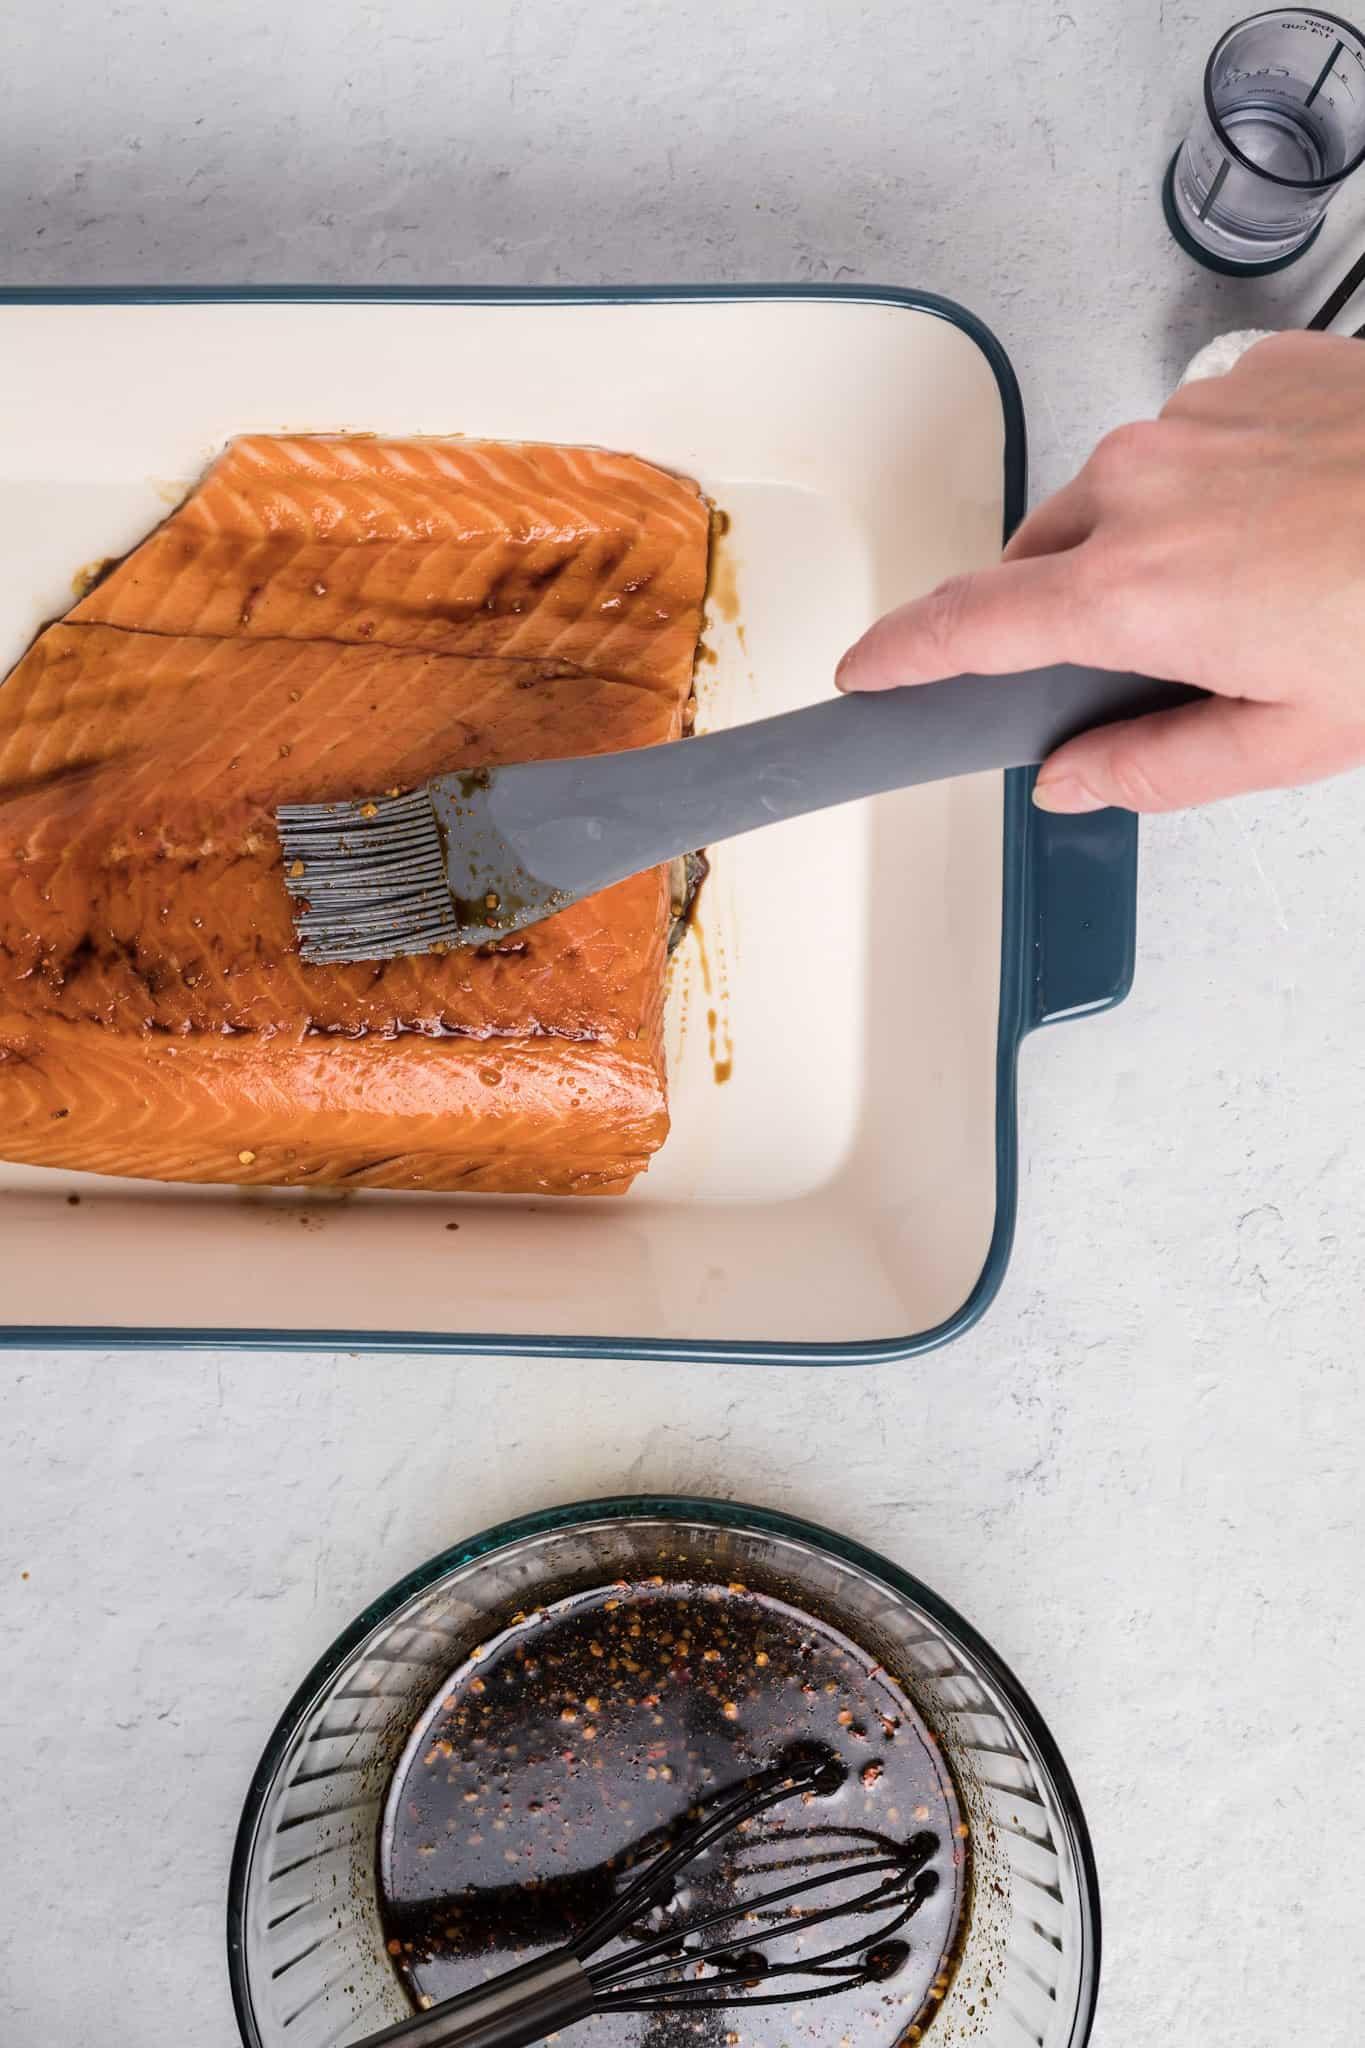 Hand brushing glaze over salmon in dish.